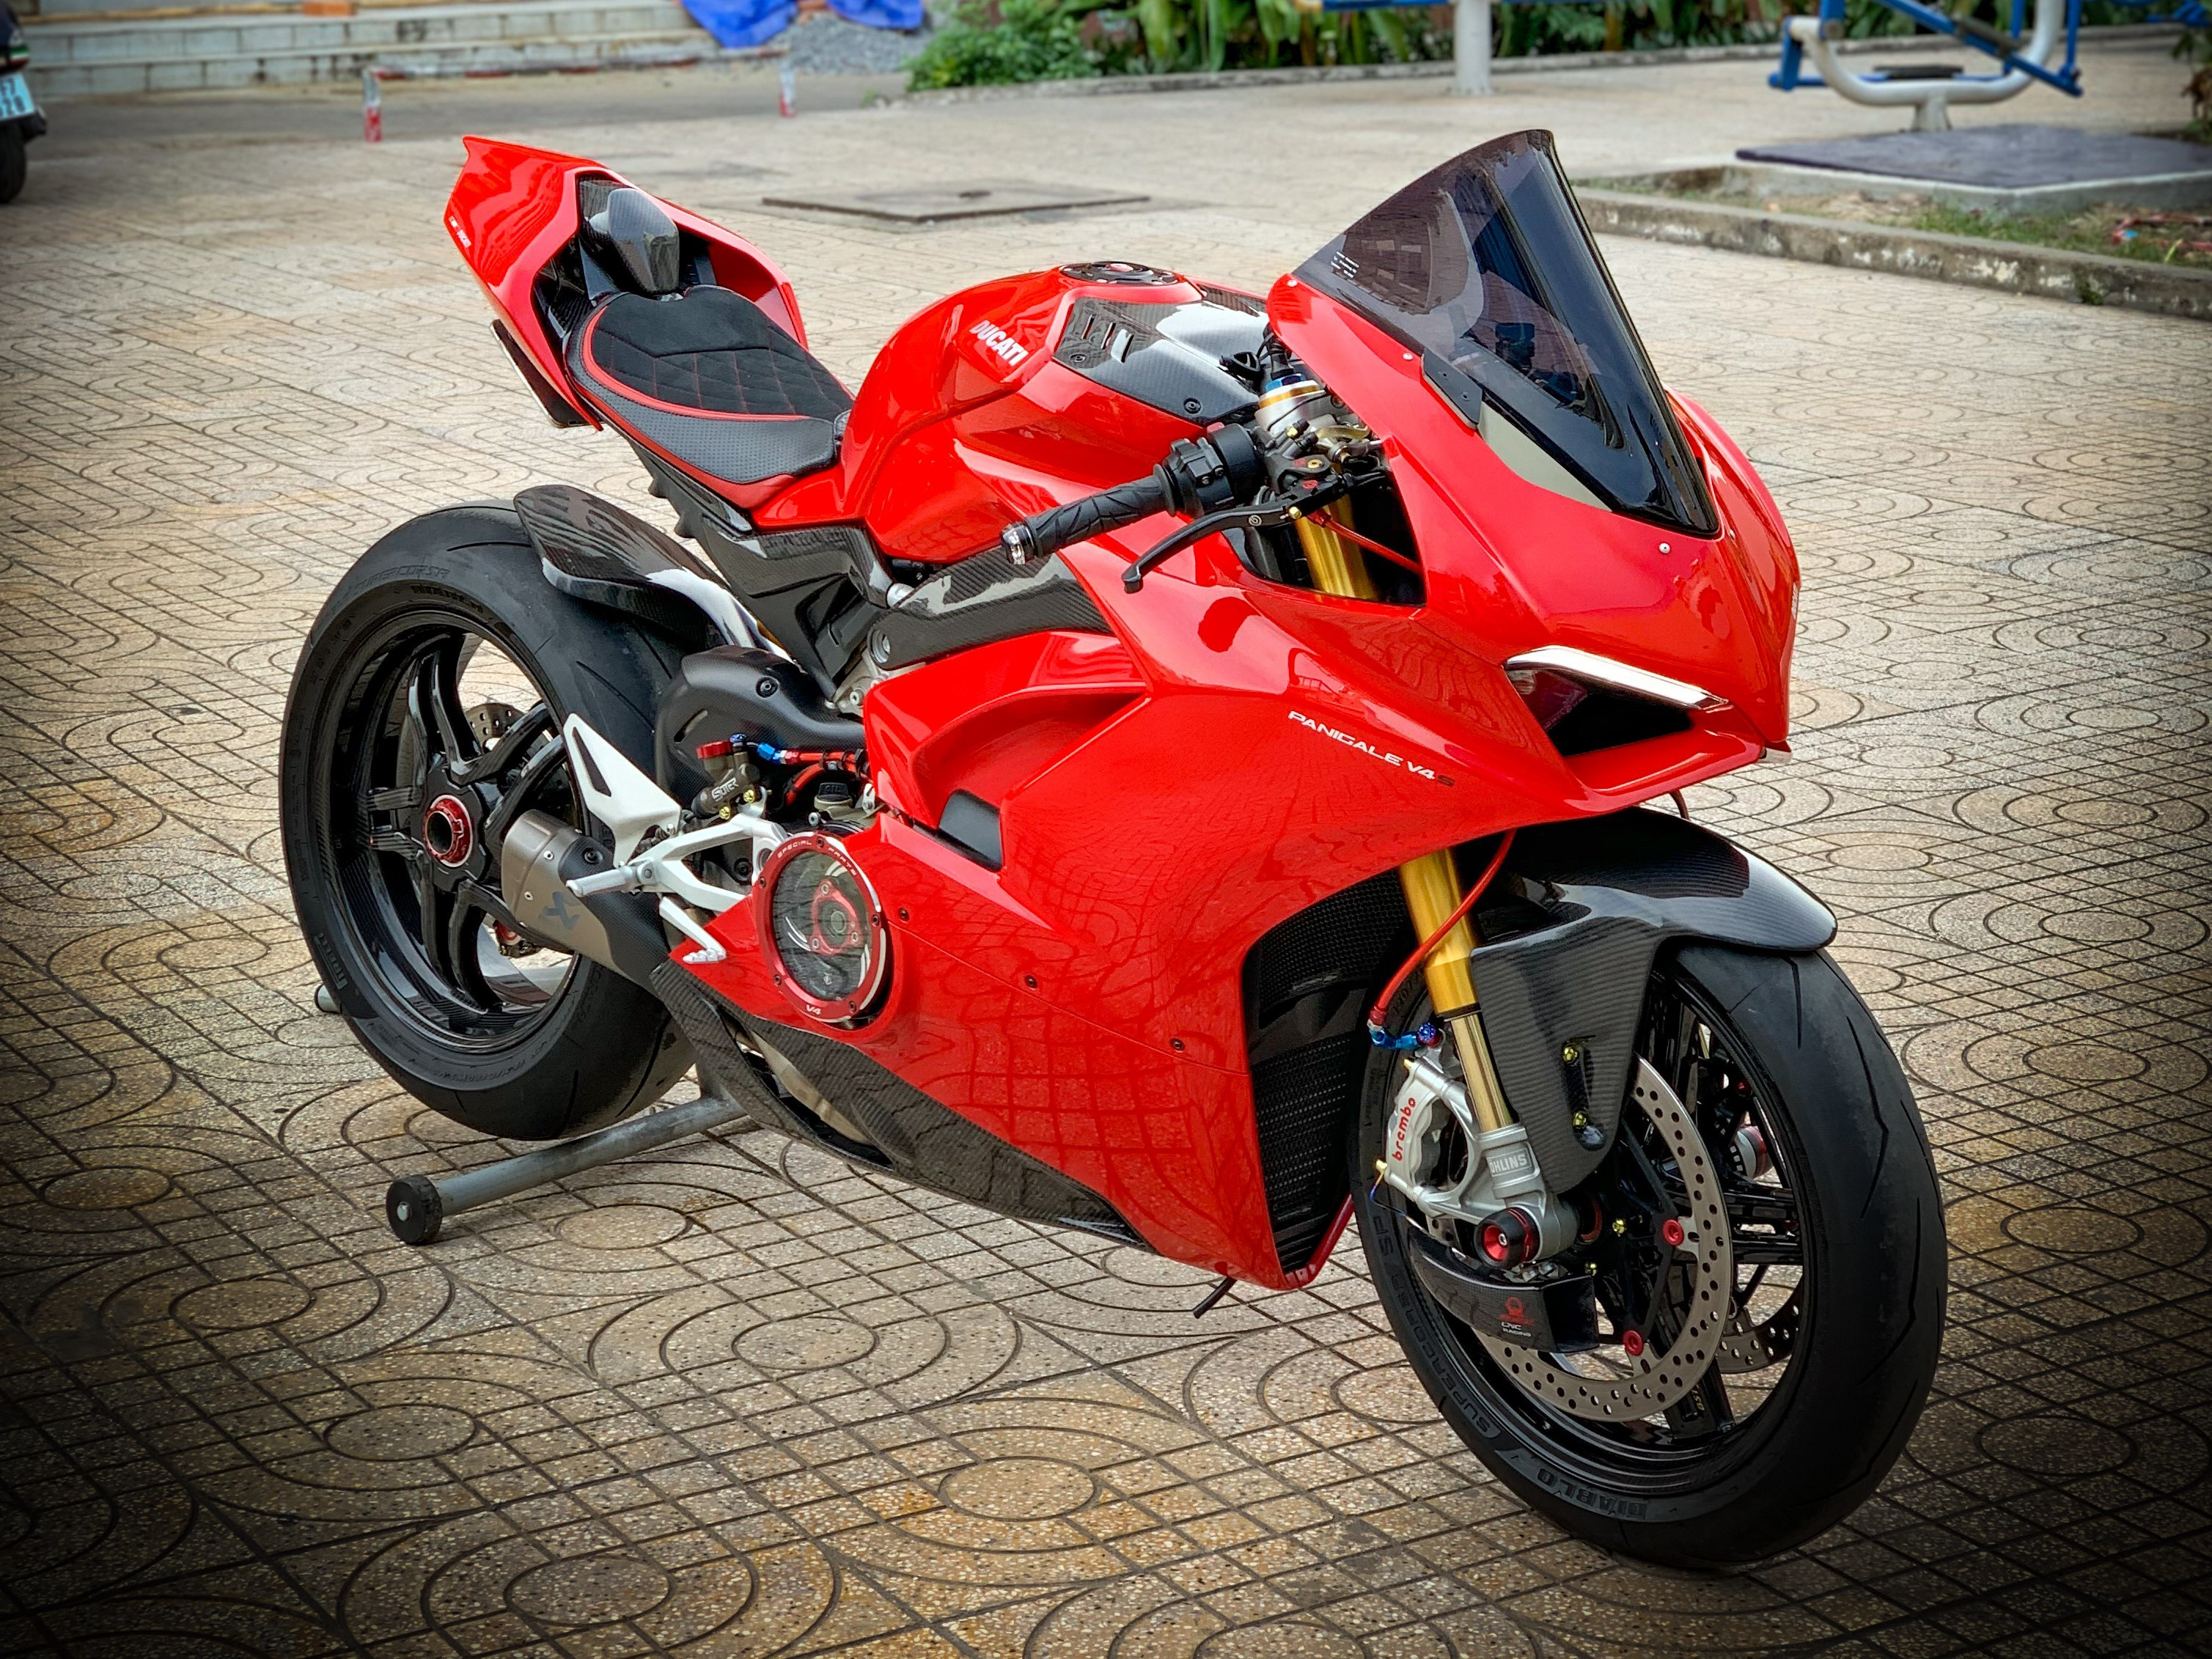 Moto tien ty Ducati Panigale V4 S voi goi do dat gia tai TP.HCM hinh anh 2 V4_7.jpeg